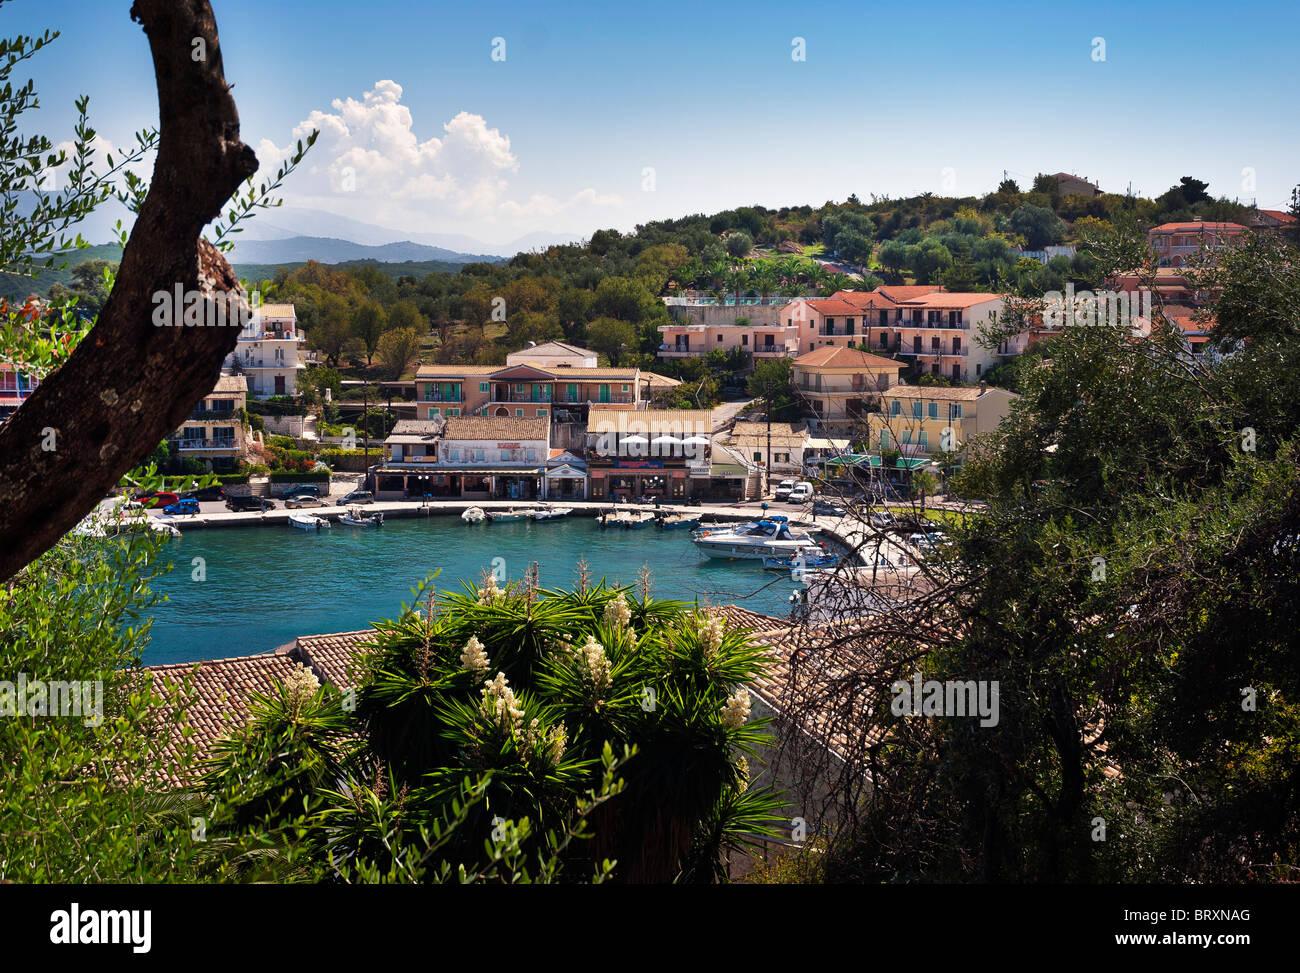 Kassiopi Village Bay Harbour, Corfu, Ionian Islands Greece. - Stock Image